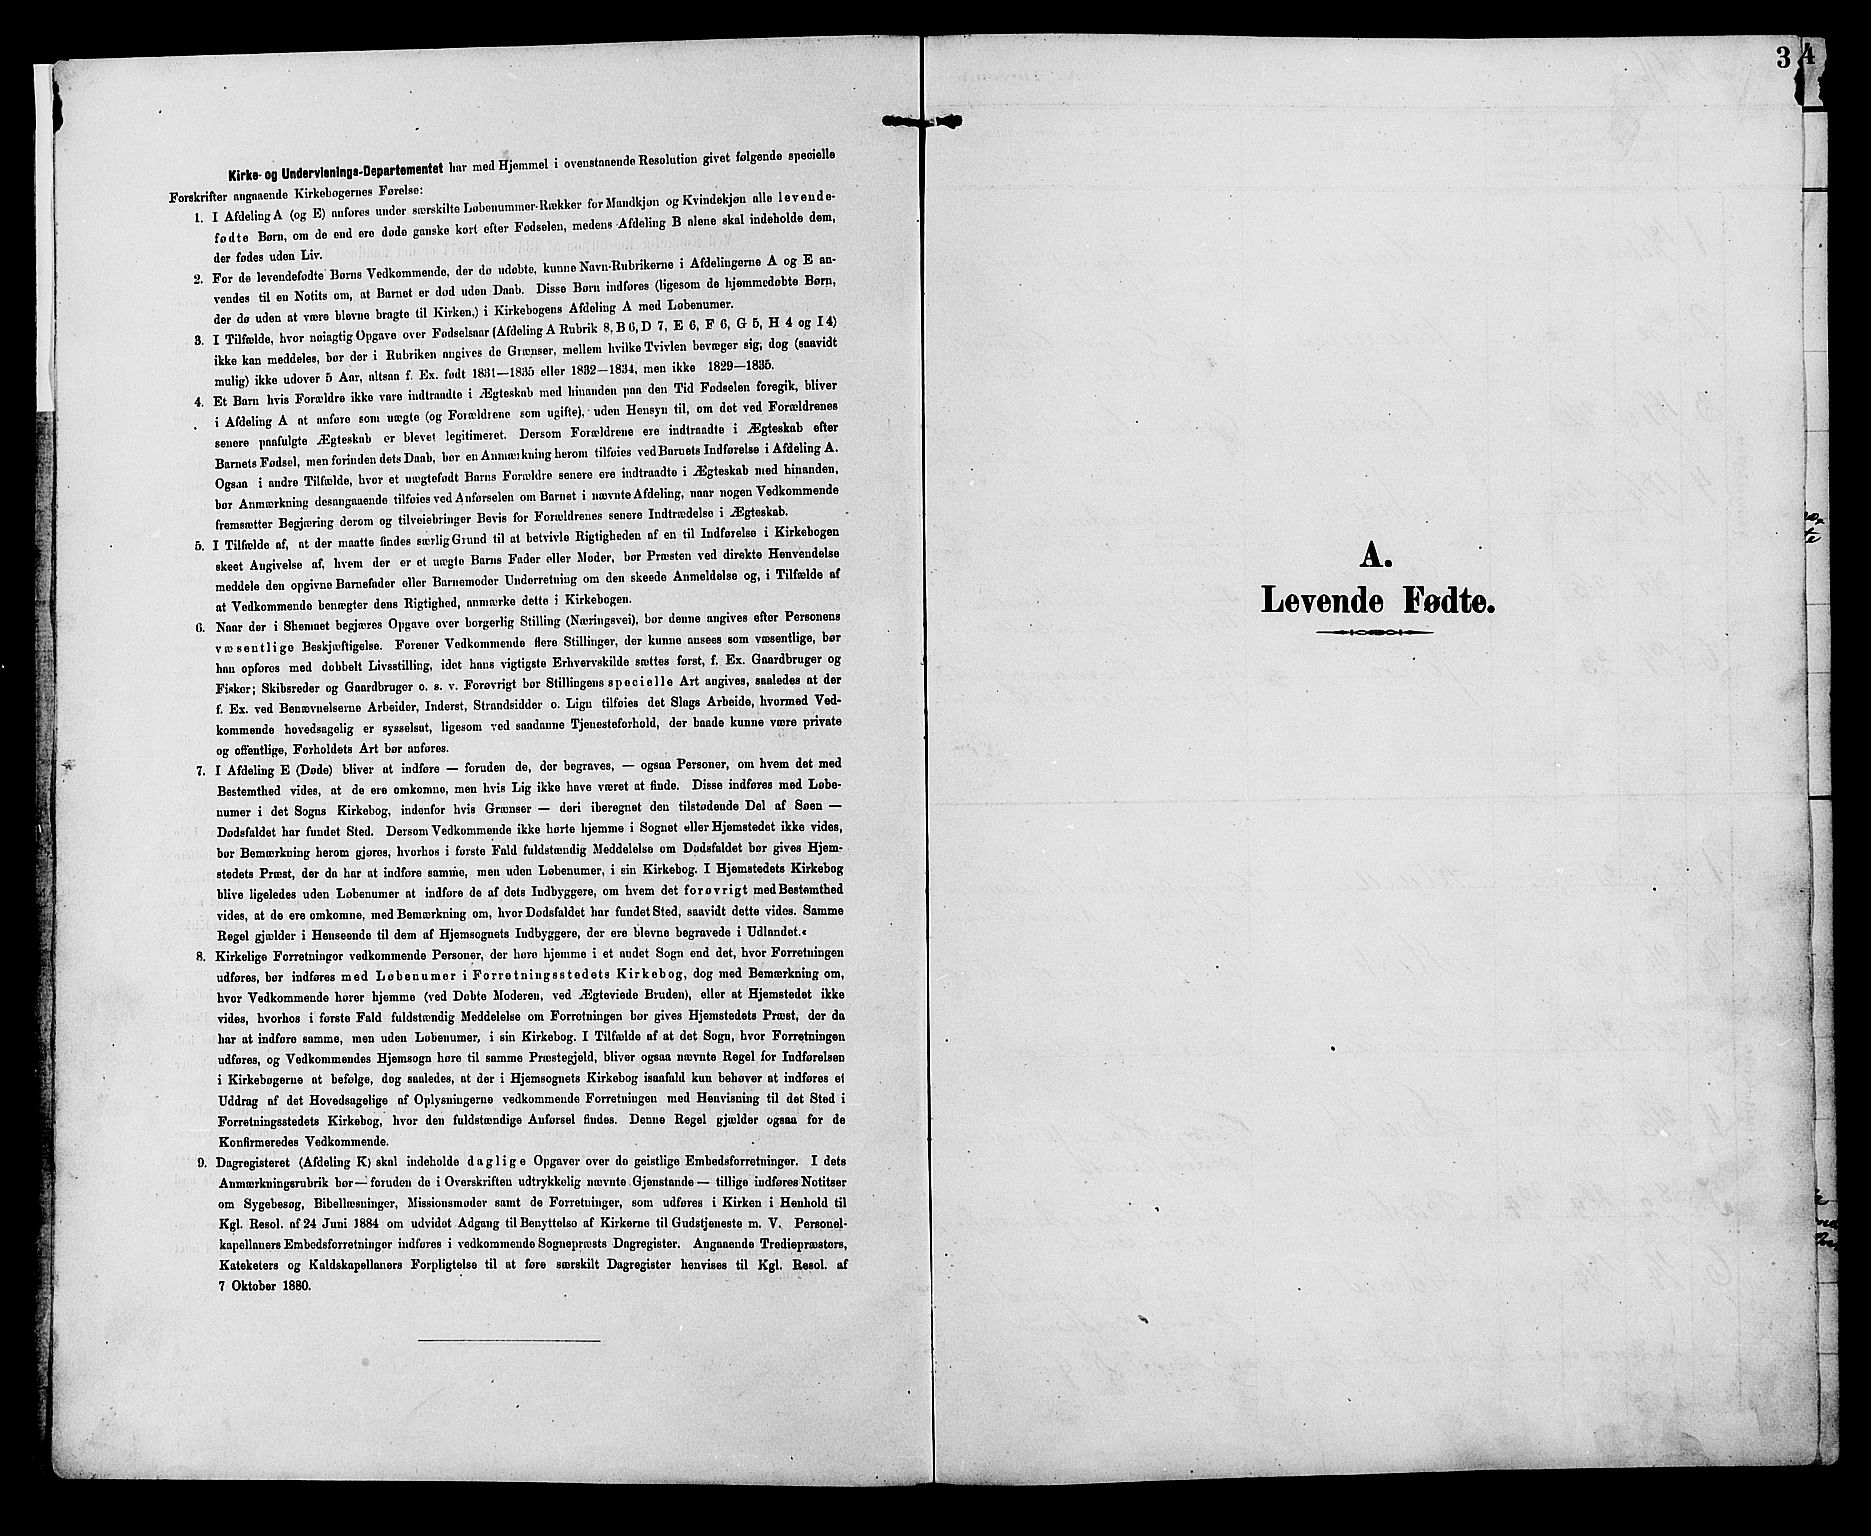 SAH, Ringebu prestekontor, Klokkerbok nr. 7, 1890-1910, s. 3